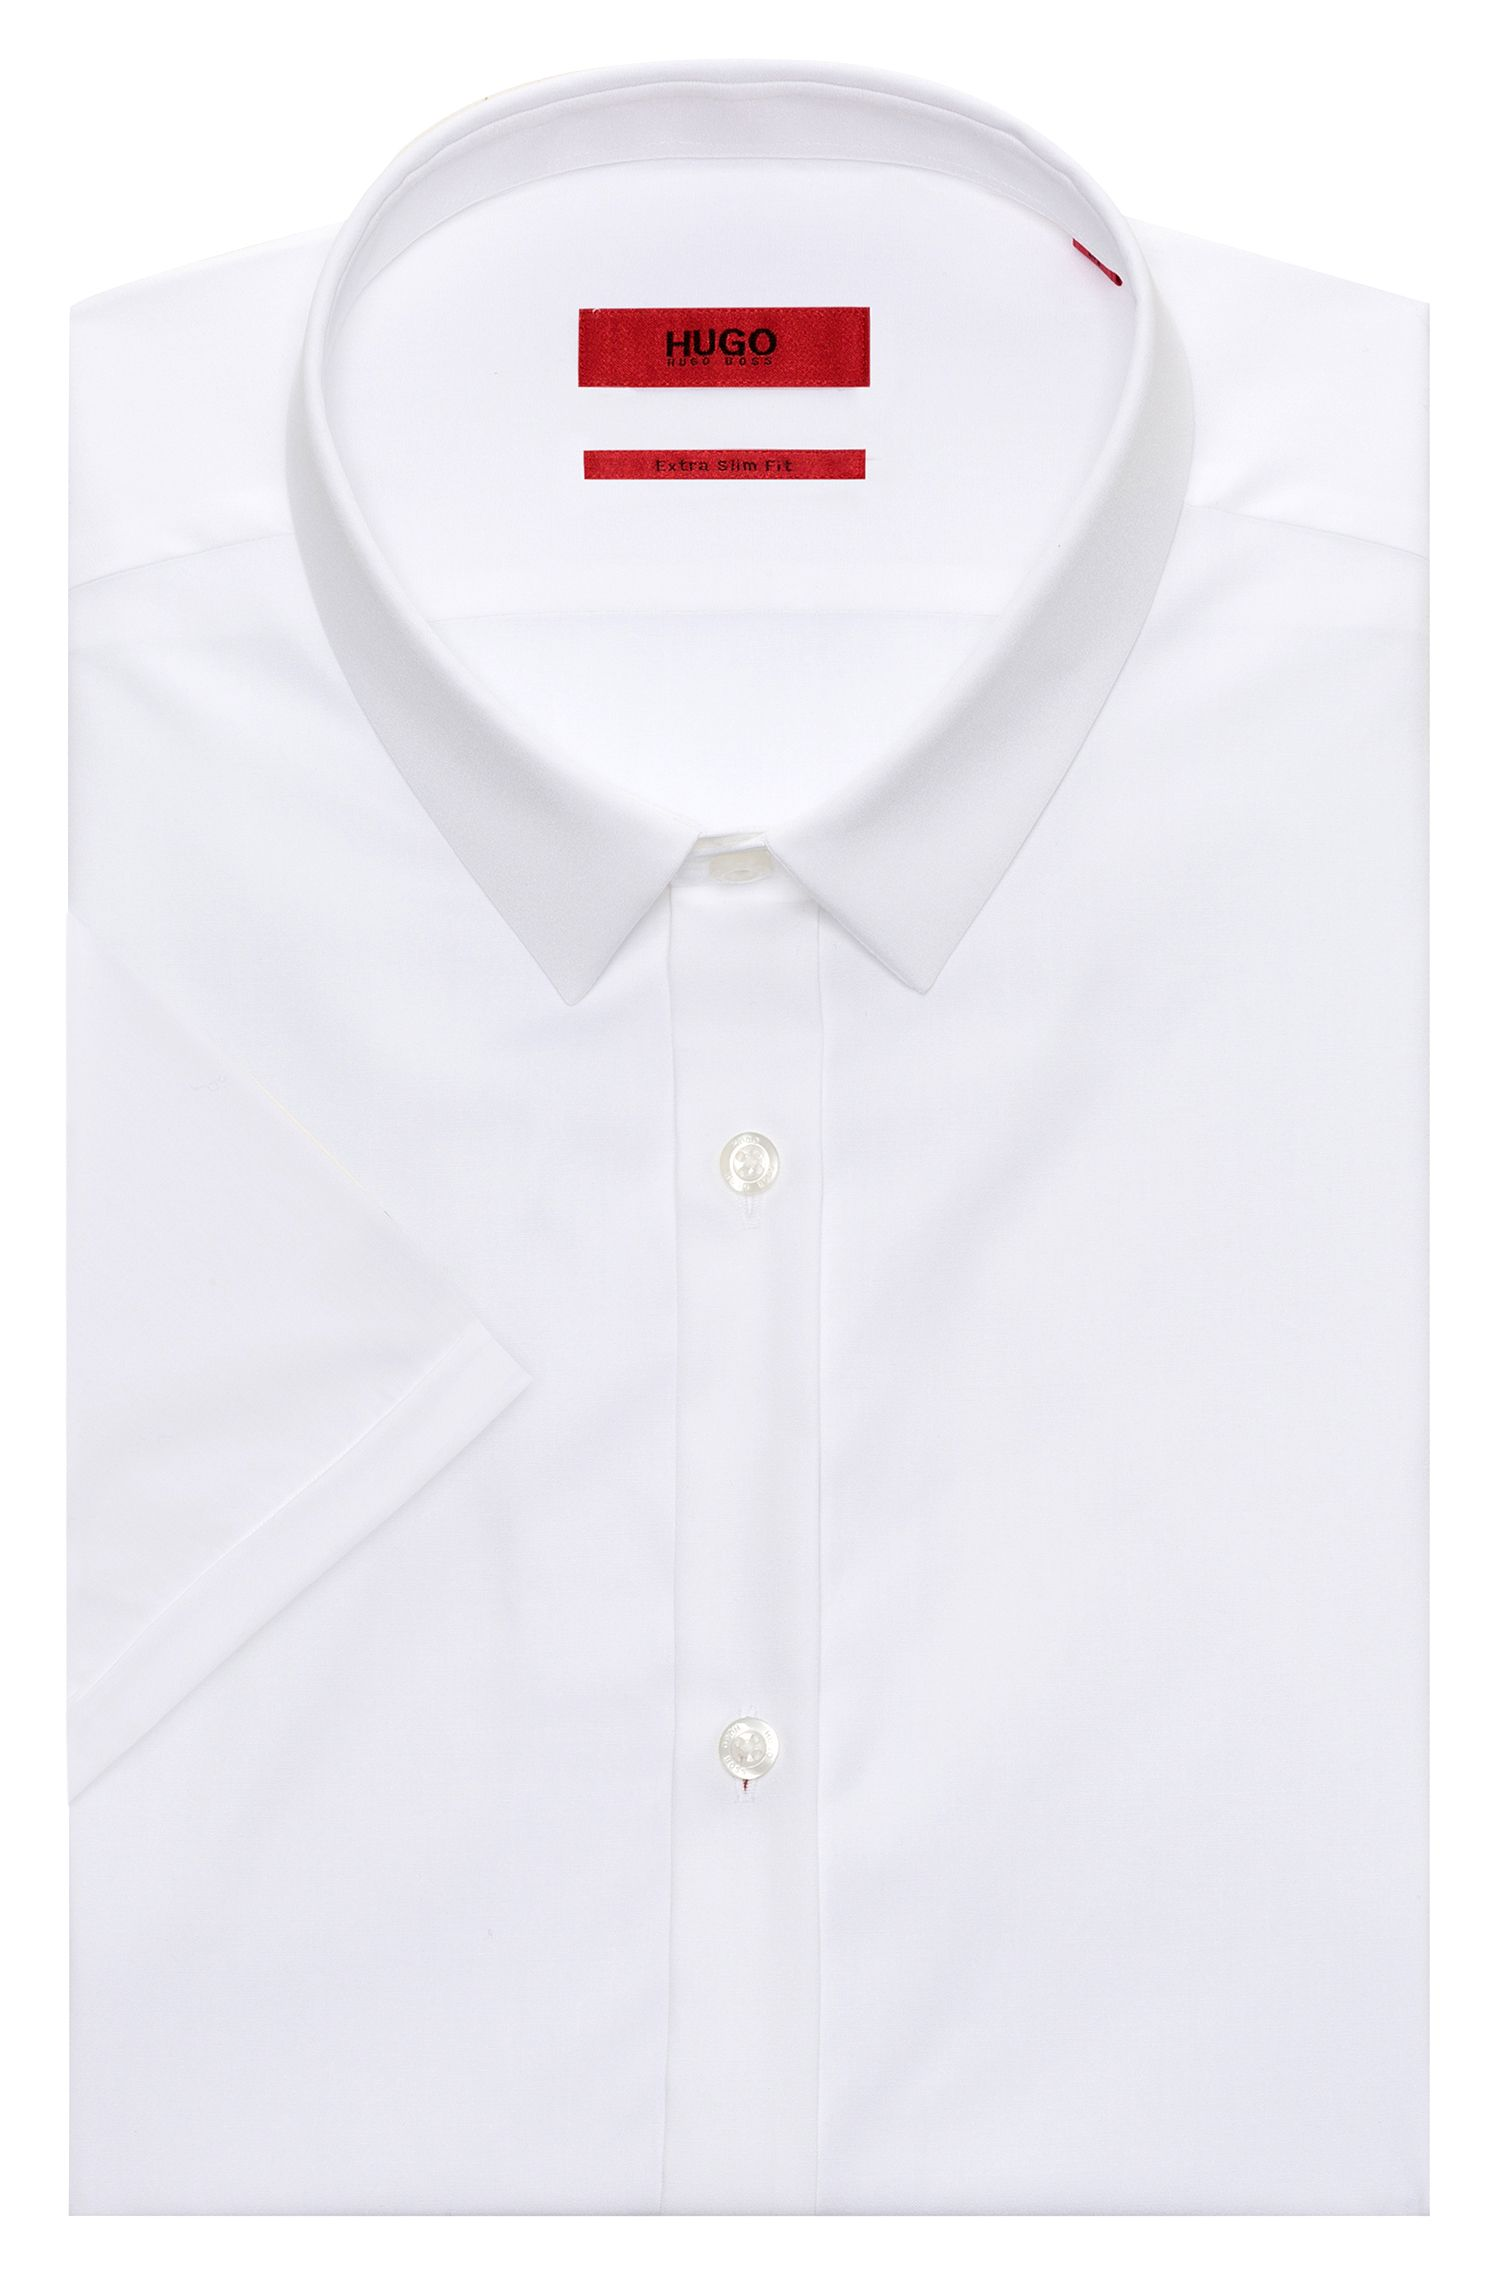 Camisa de manga corta extra slim fit en puro algodón